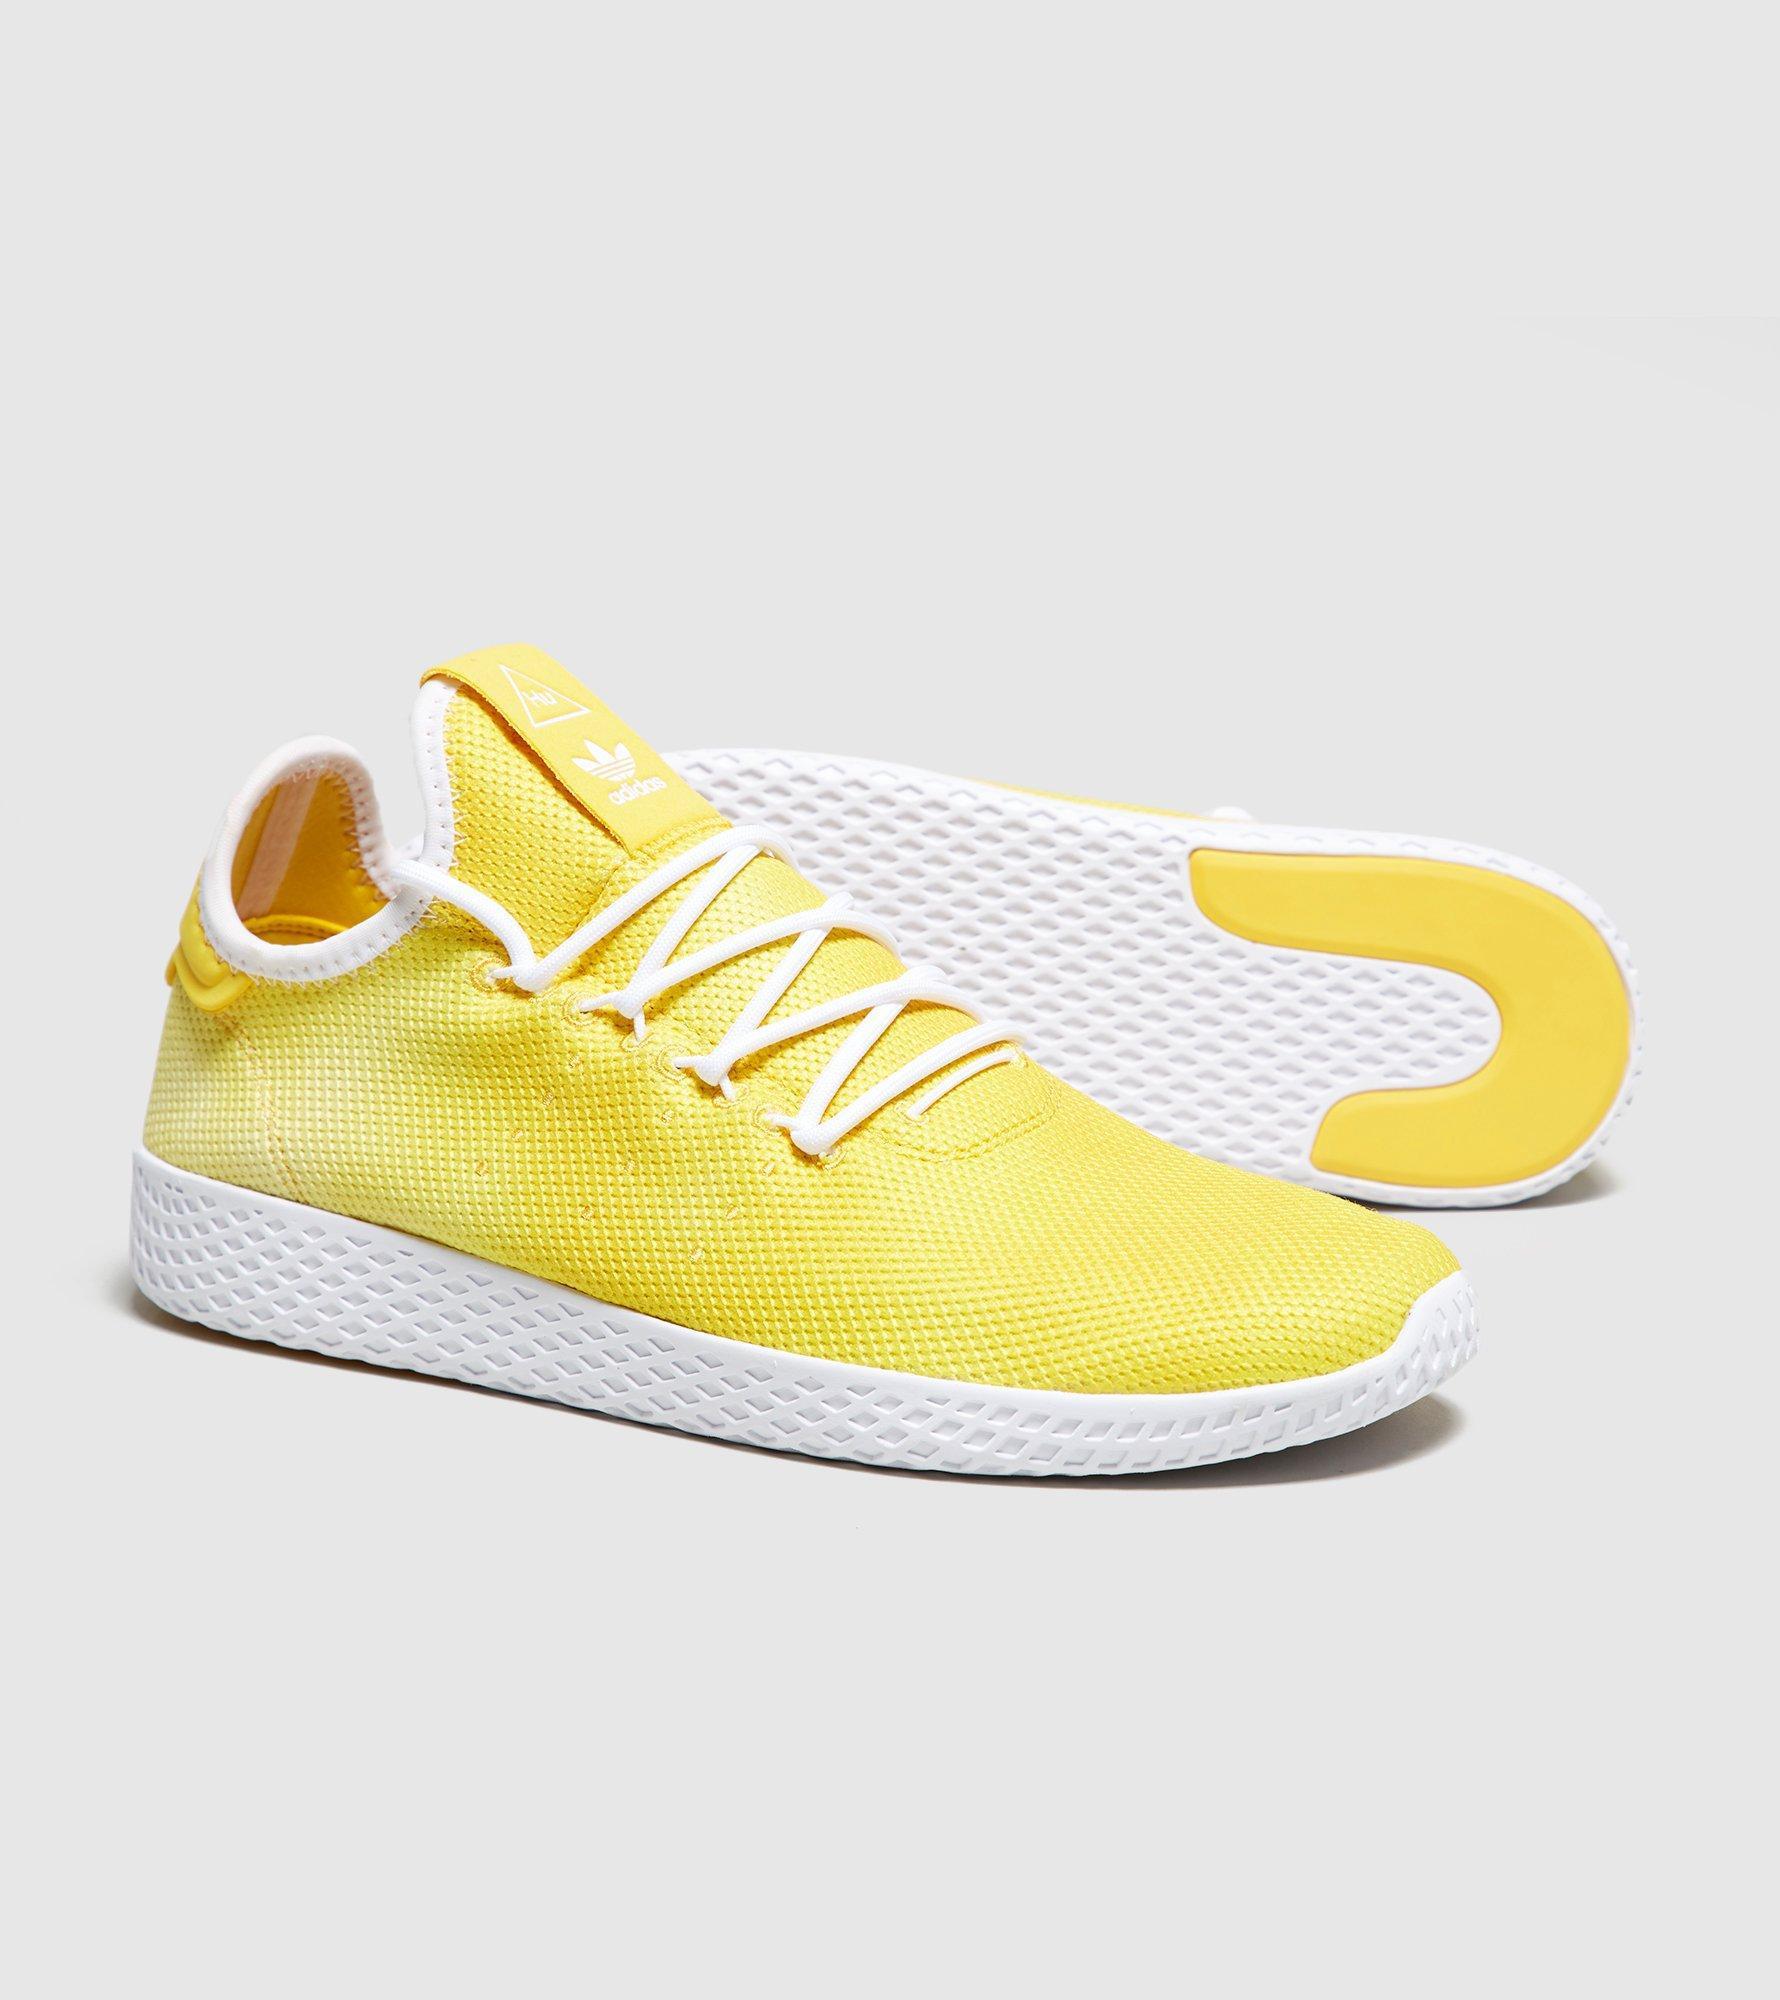 88e29aa21eda8 adidas Originals X Pharrell Williams Holi Tennis Hu in Yellow for ...